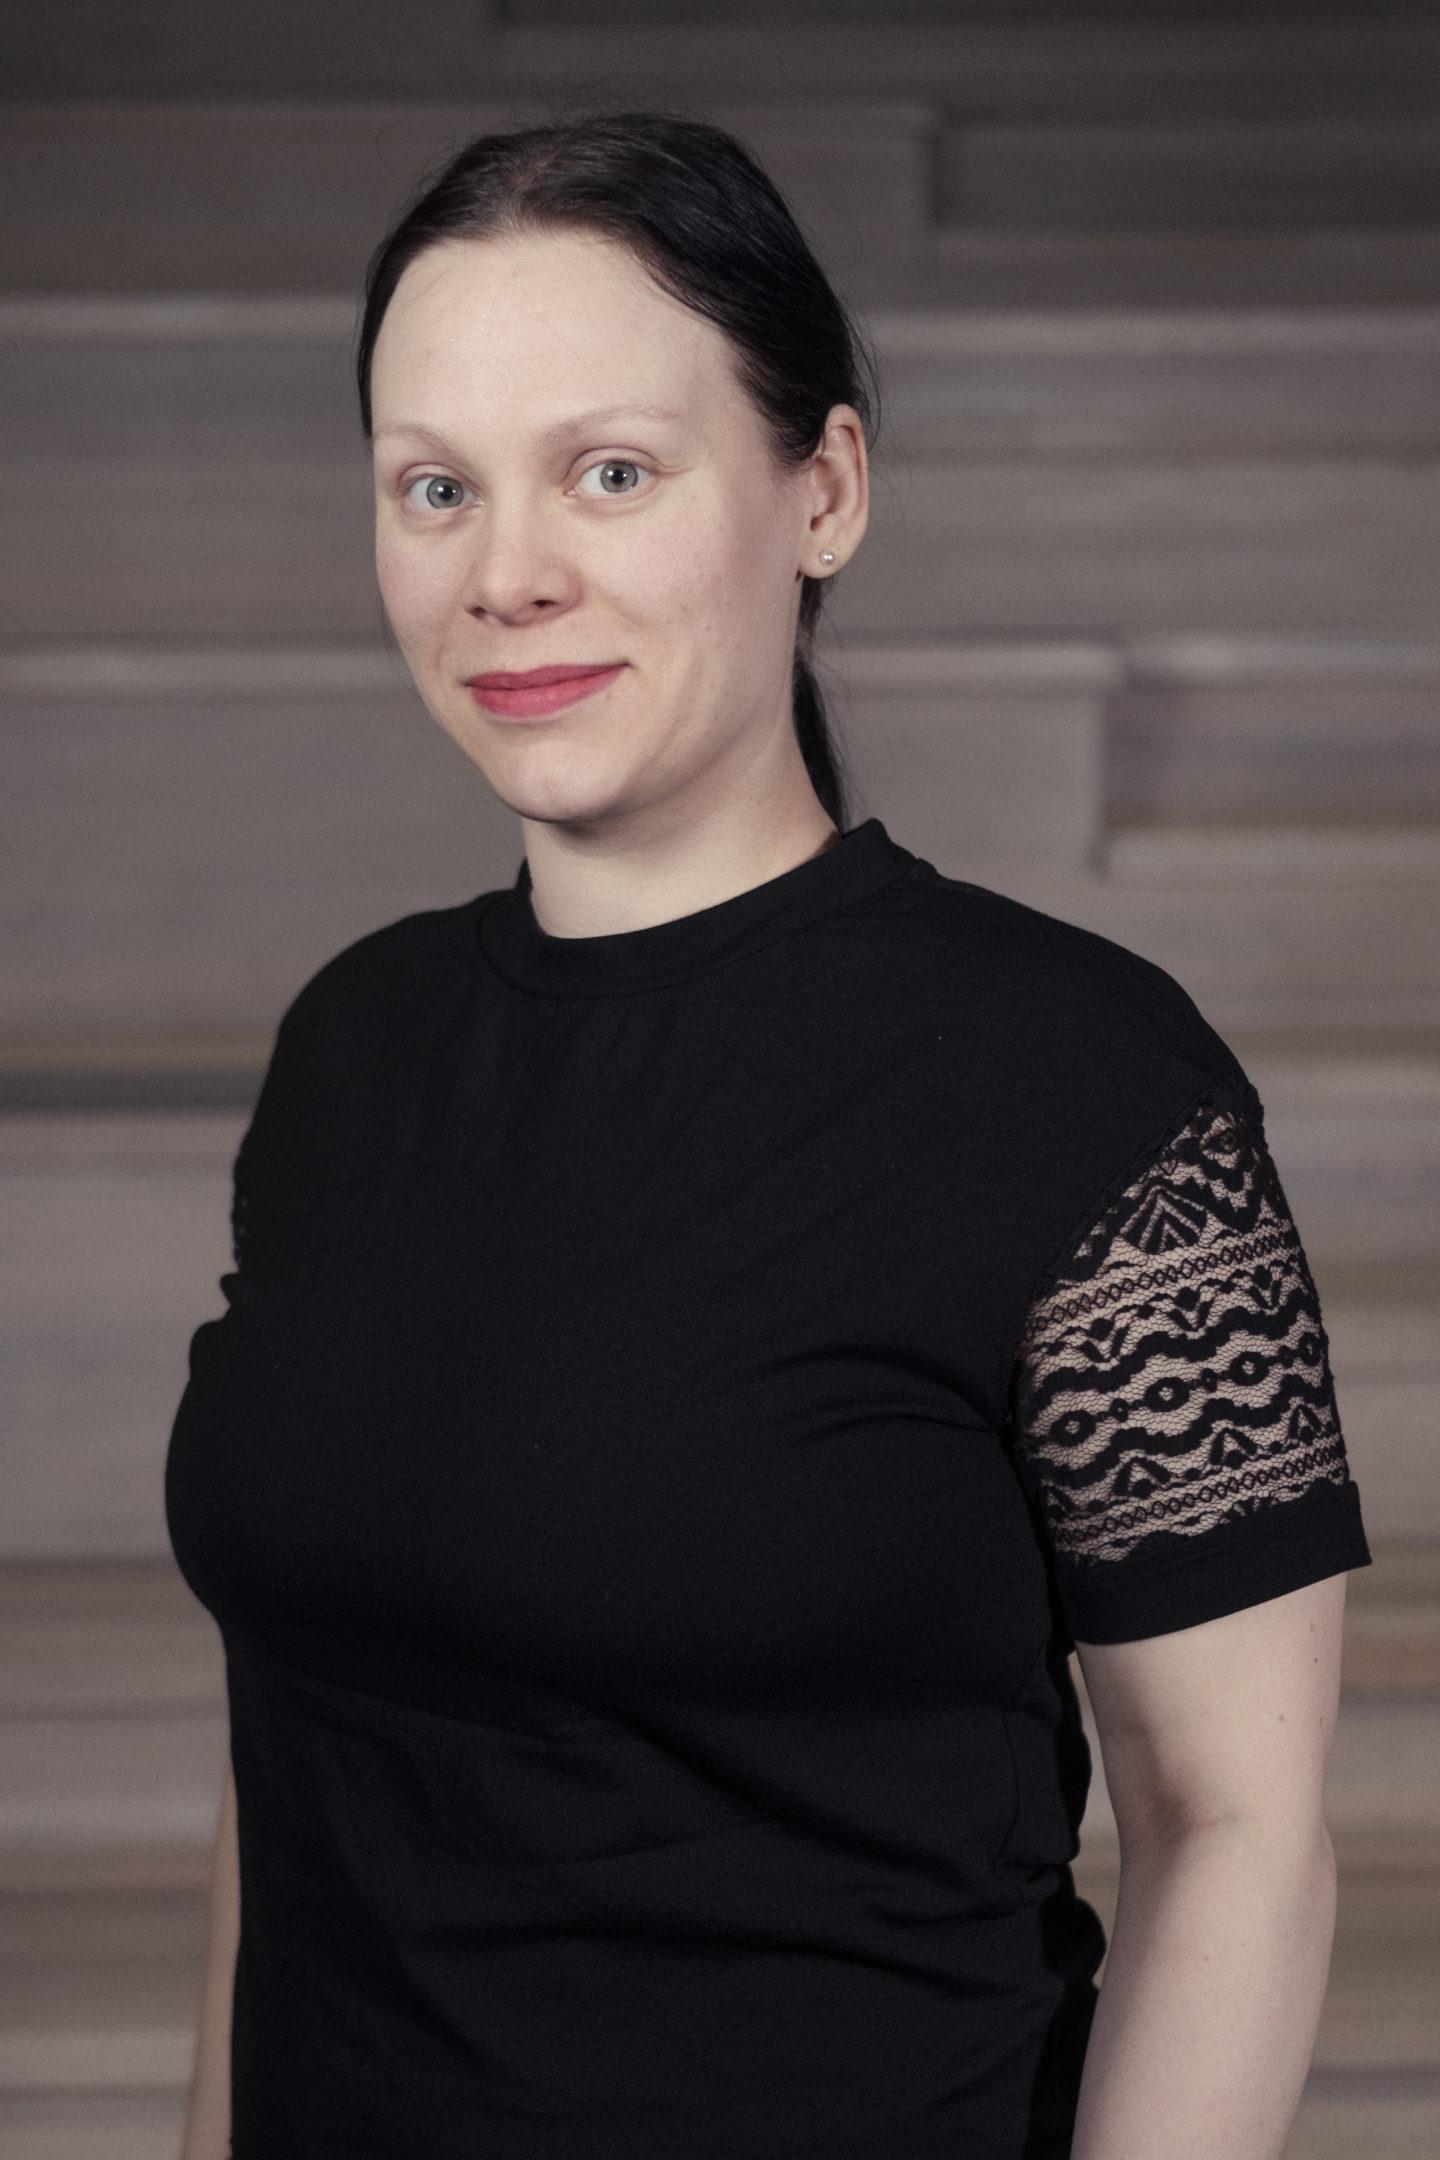 Anna Wallgren